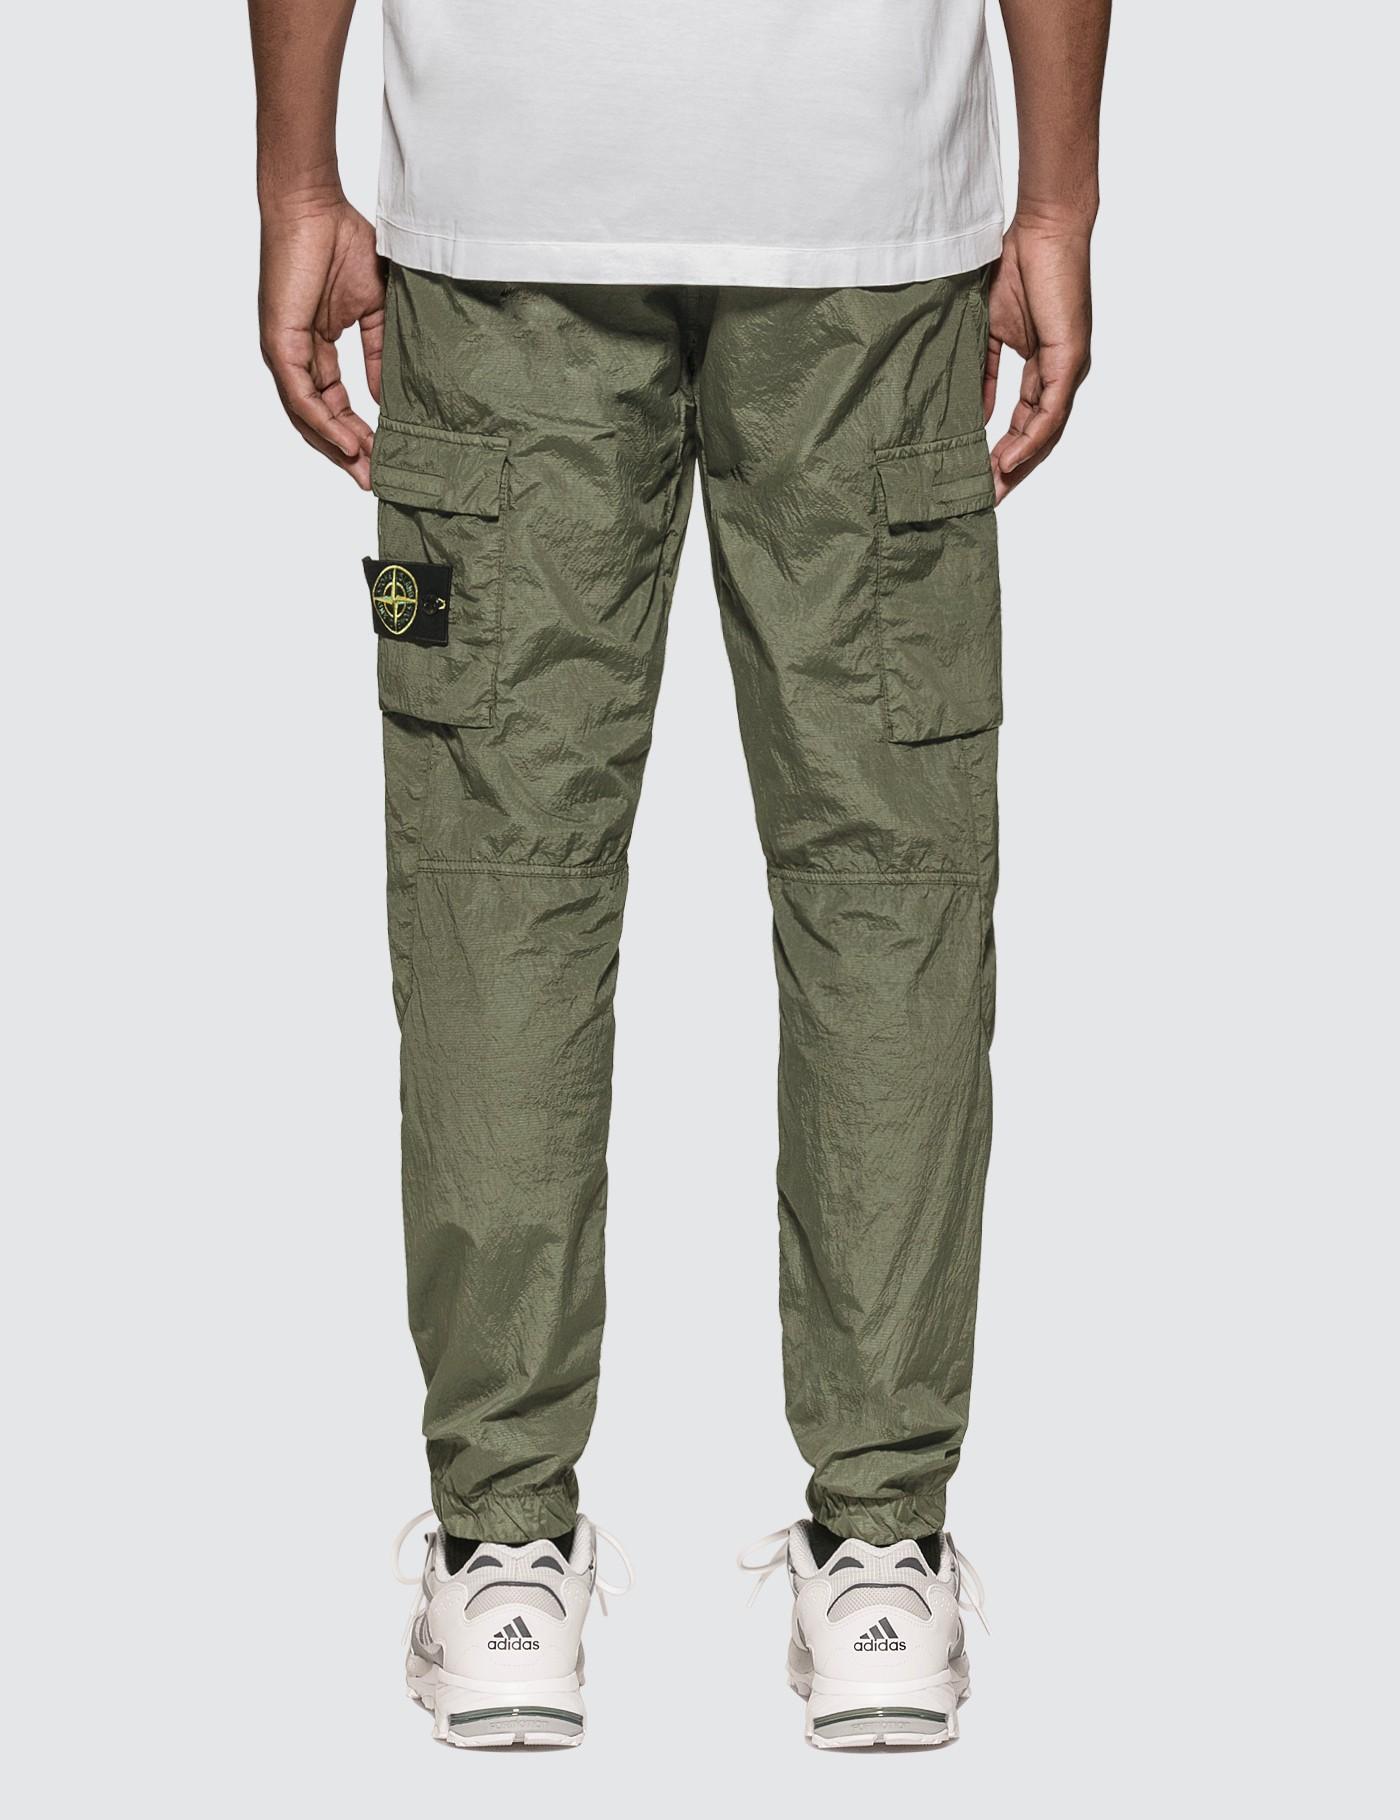 Stone Island Synthetic Nylon Seersucker Cargo Pants in ...